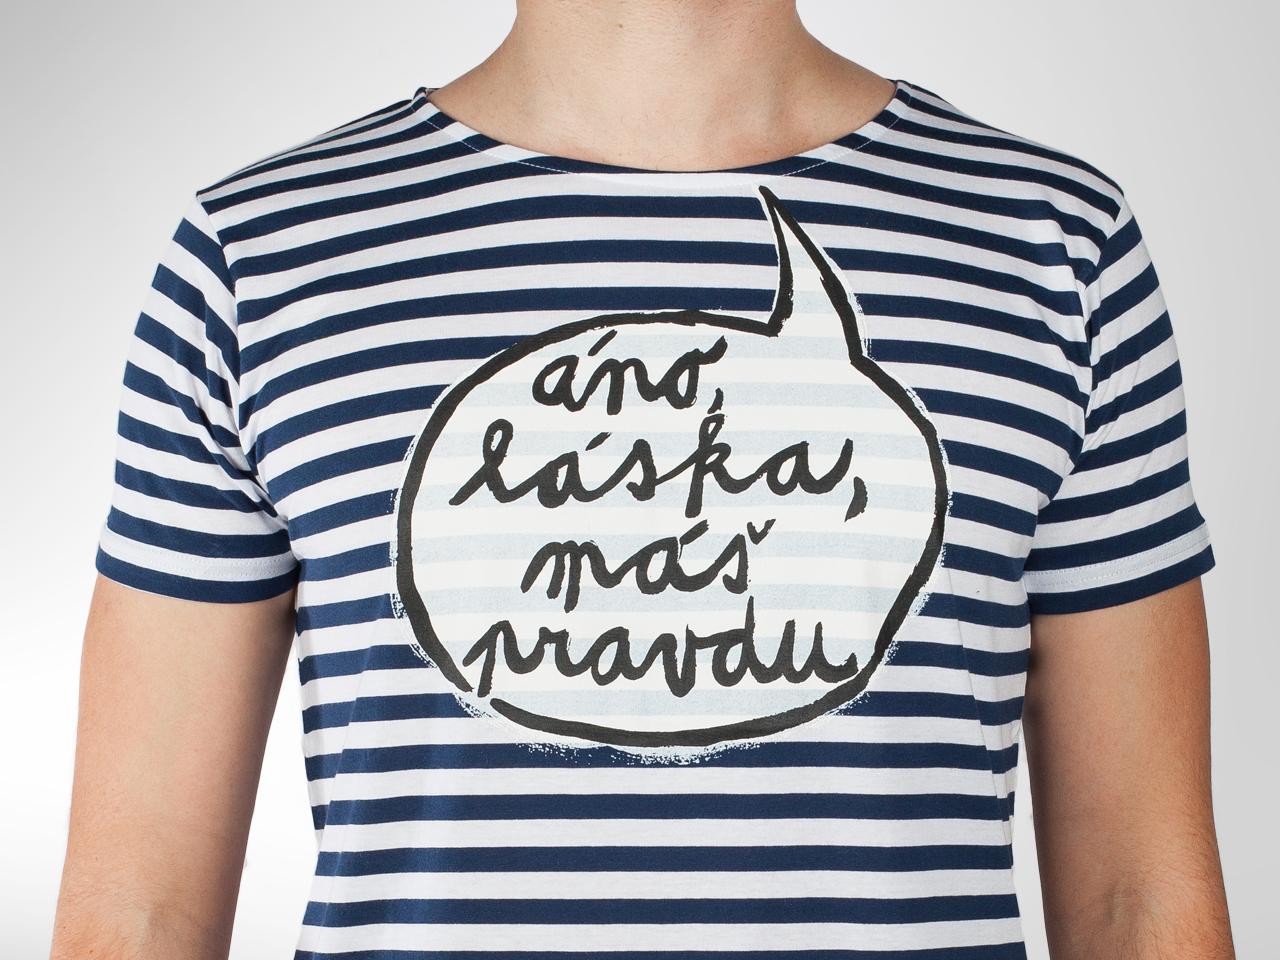 d5670f232 Pánske tričko Máš pravdu pre ideálneho muža značky Koláčová — Kompot.sk